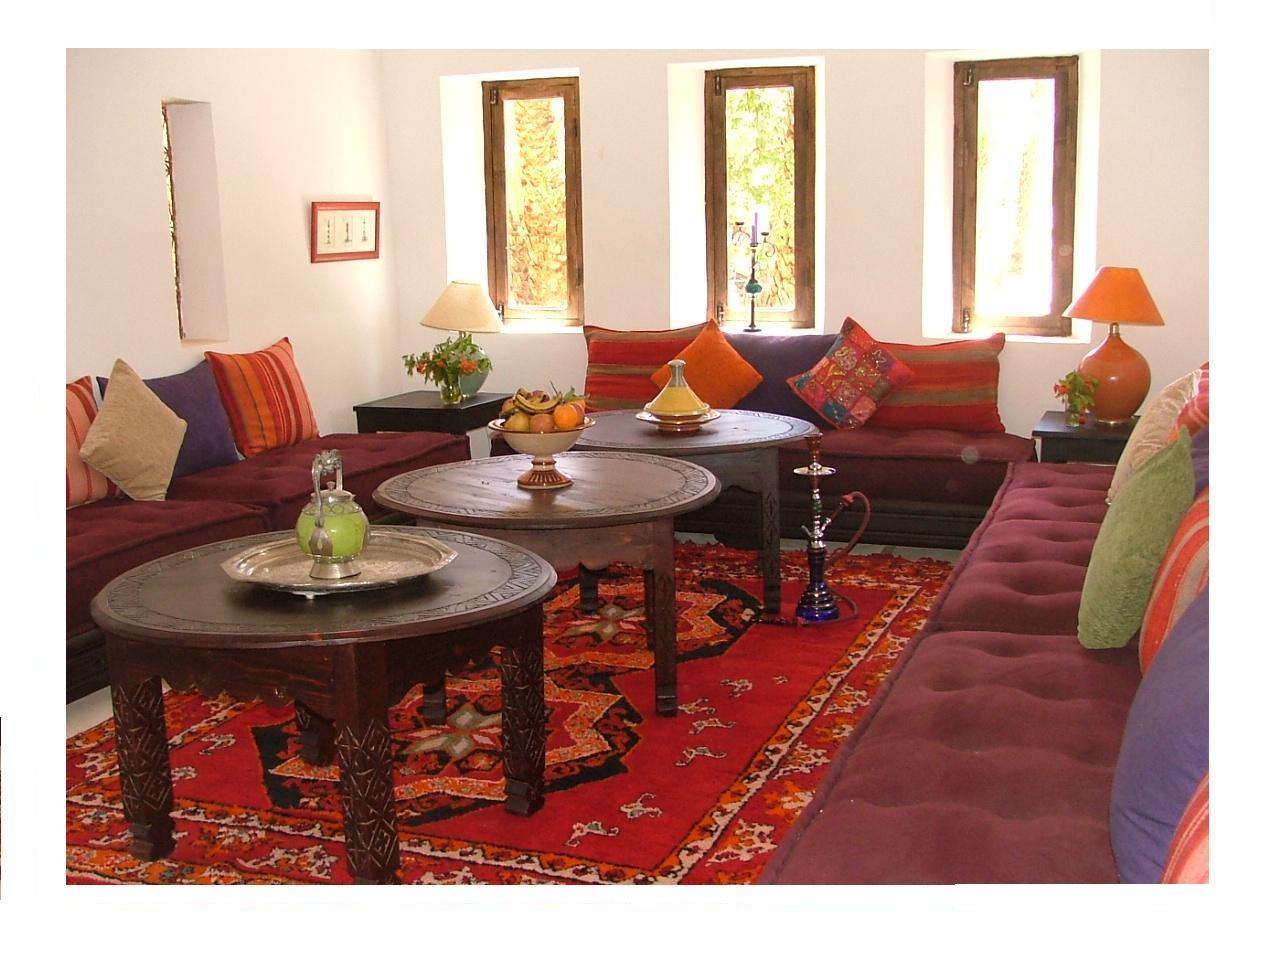 Kasbah azul agdz maroc for Avito salon marocain casablanca